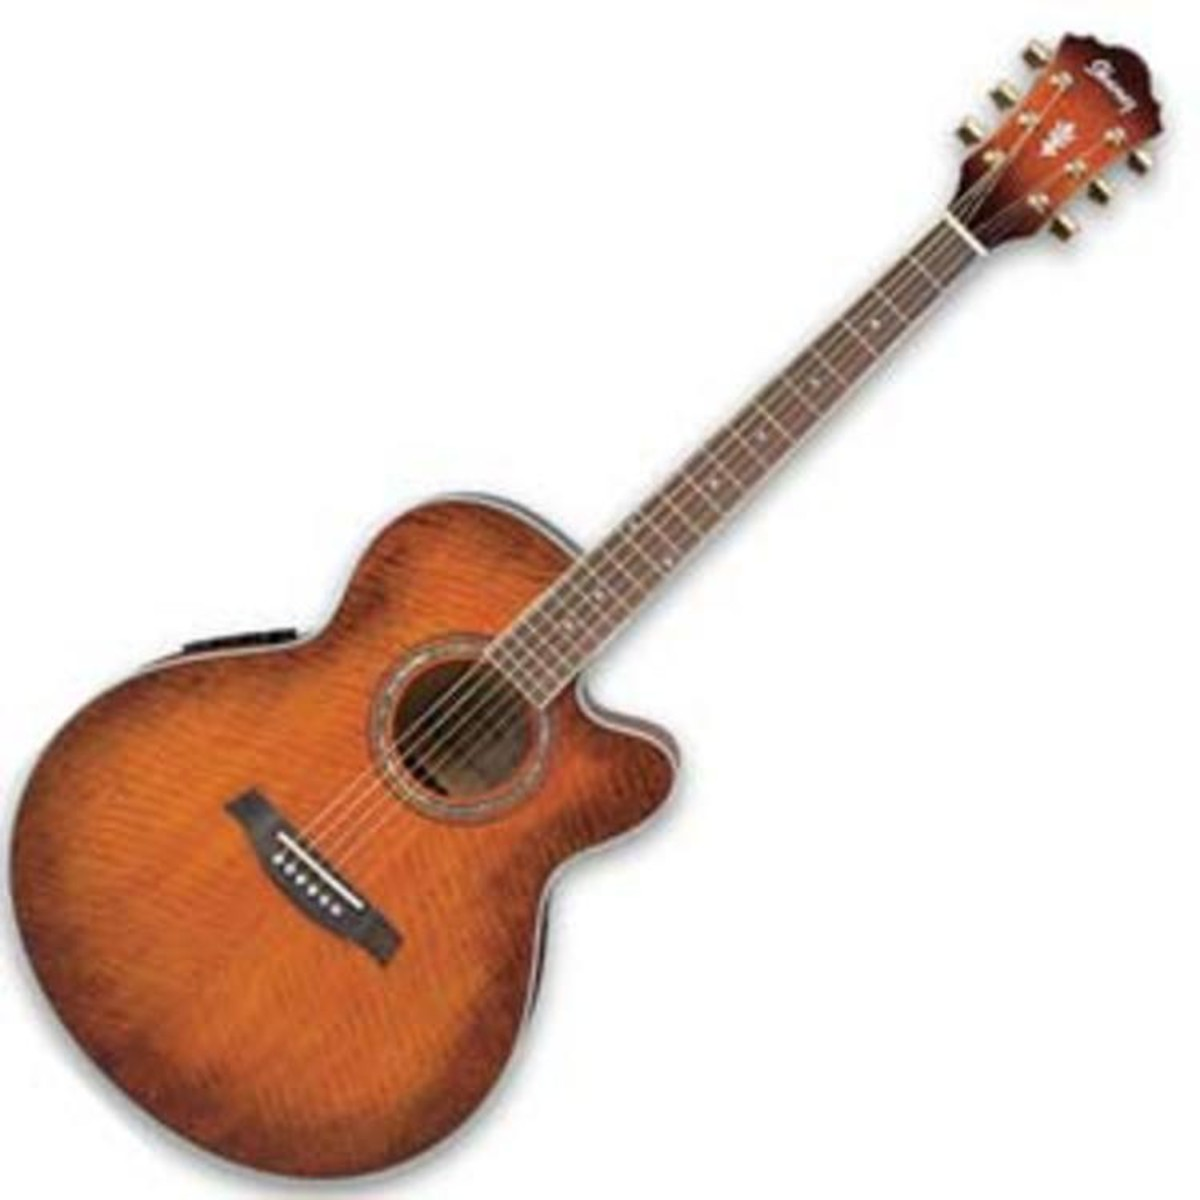 abandonn es ibanez ael20e guitare electro acoustique. Black Bedroom Furniture Sets. Home Design Ideas